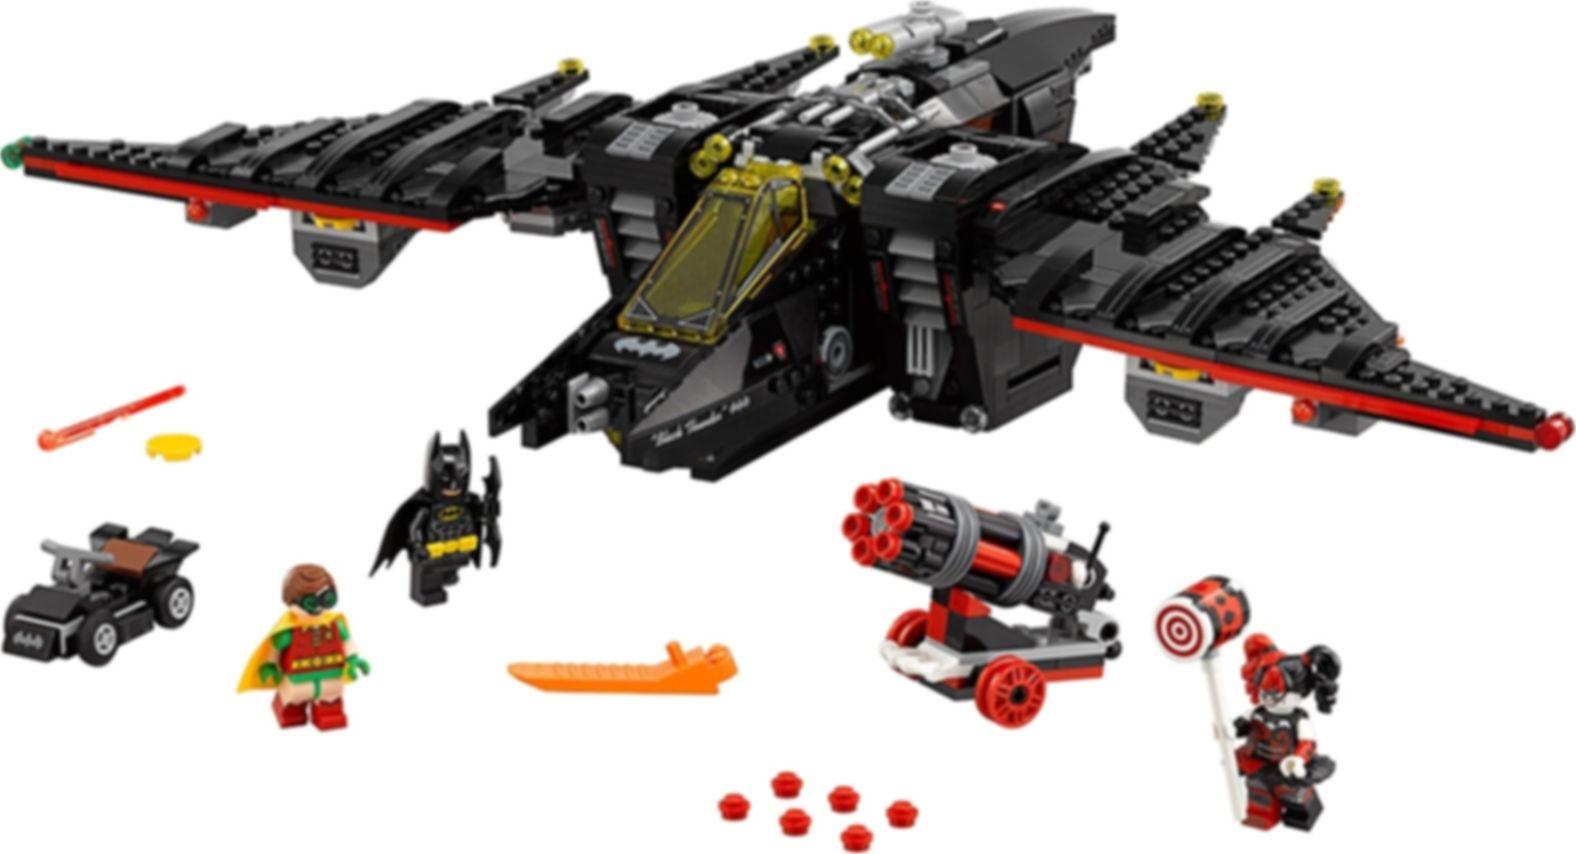 LEGO® Batman Movie The Batwing components